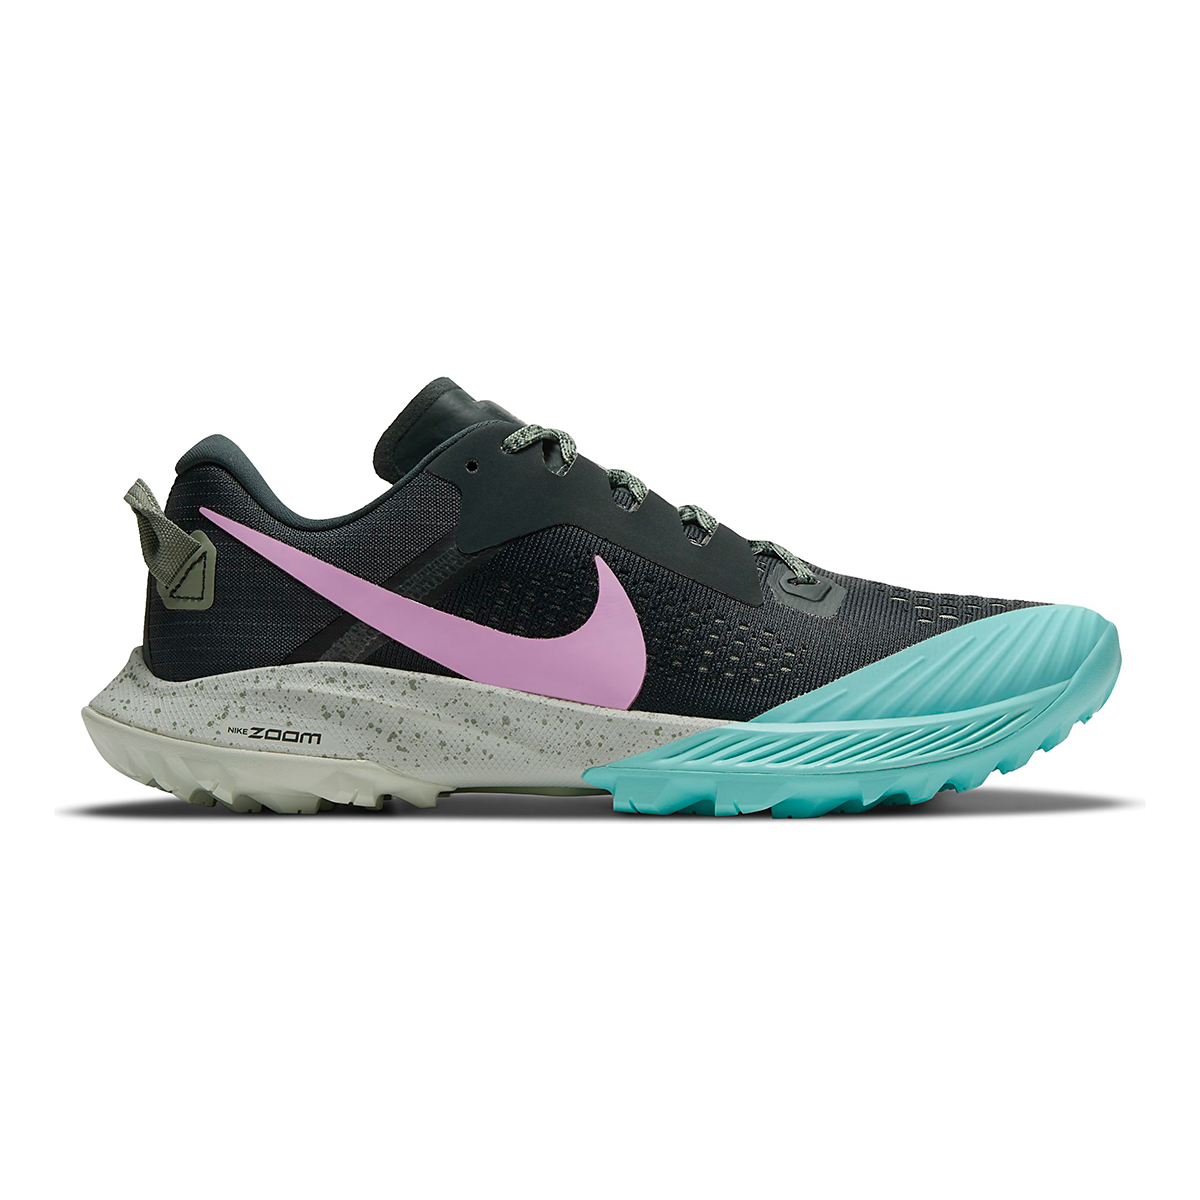 Women's Nike Air Zoom Terra Kiger 6 Trail Running Shoe - Color: Seaweed/Beyond Pink - Size: 5 - Width: Regular, Seaweed/Beyond Pink, large, image 1